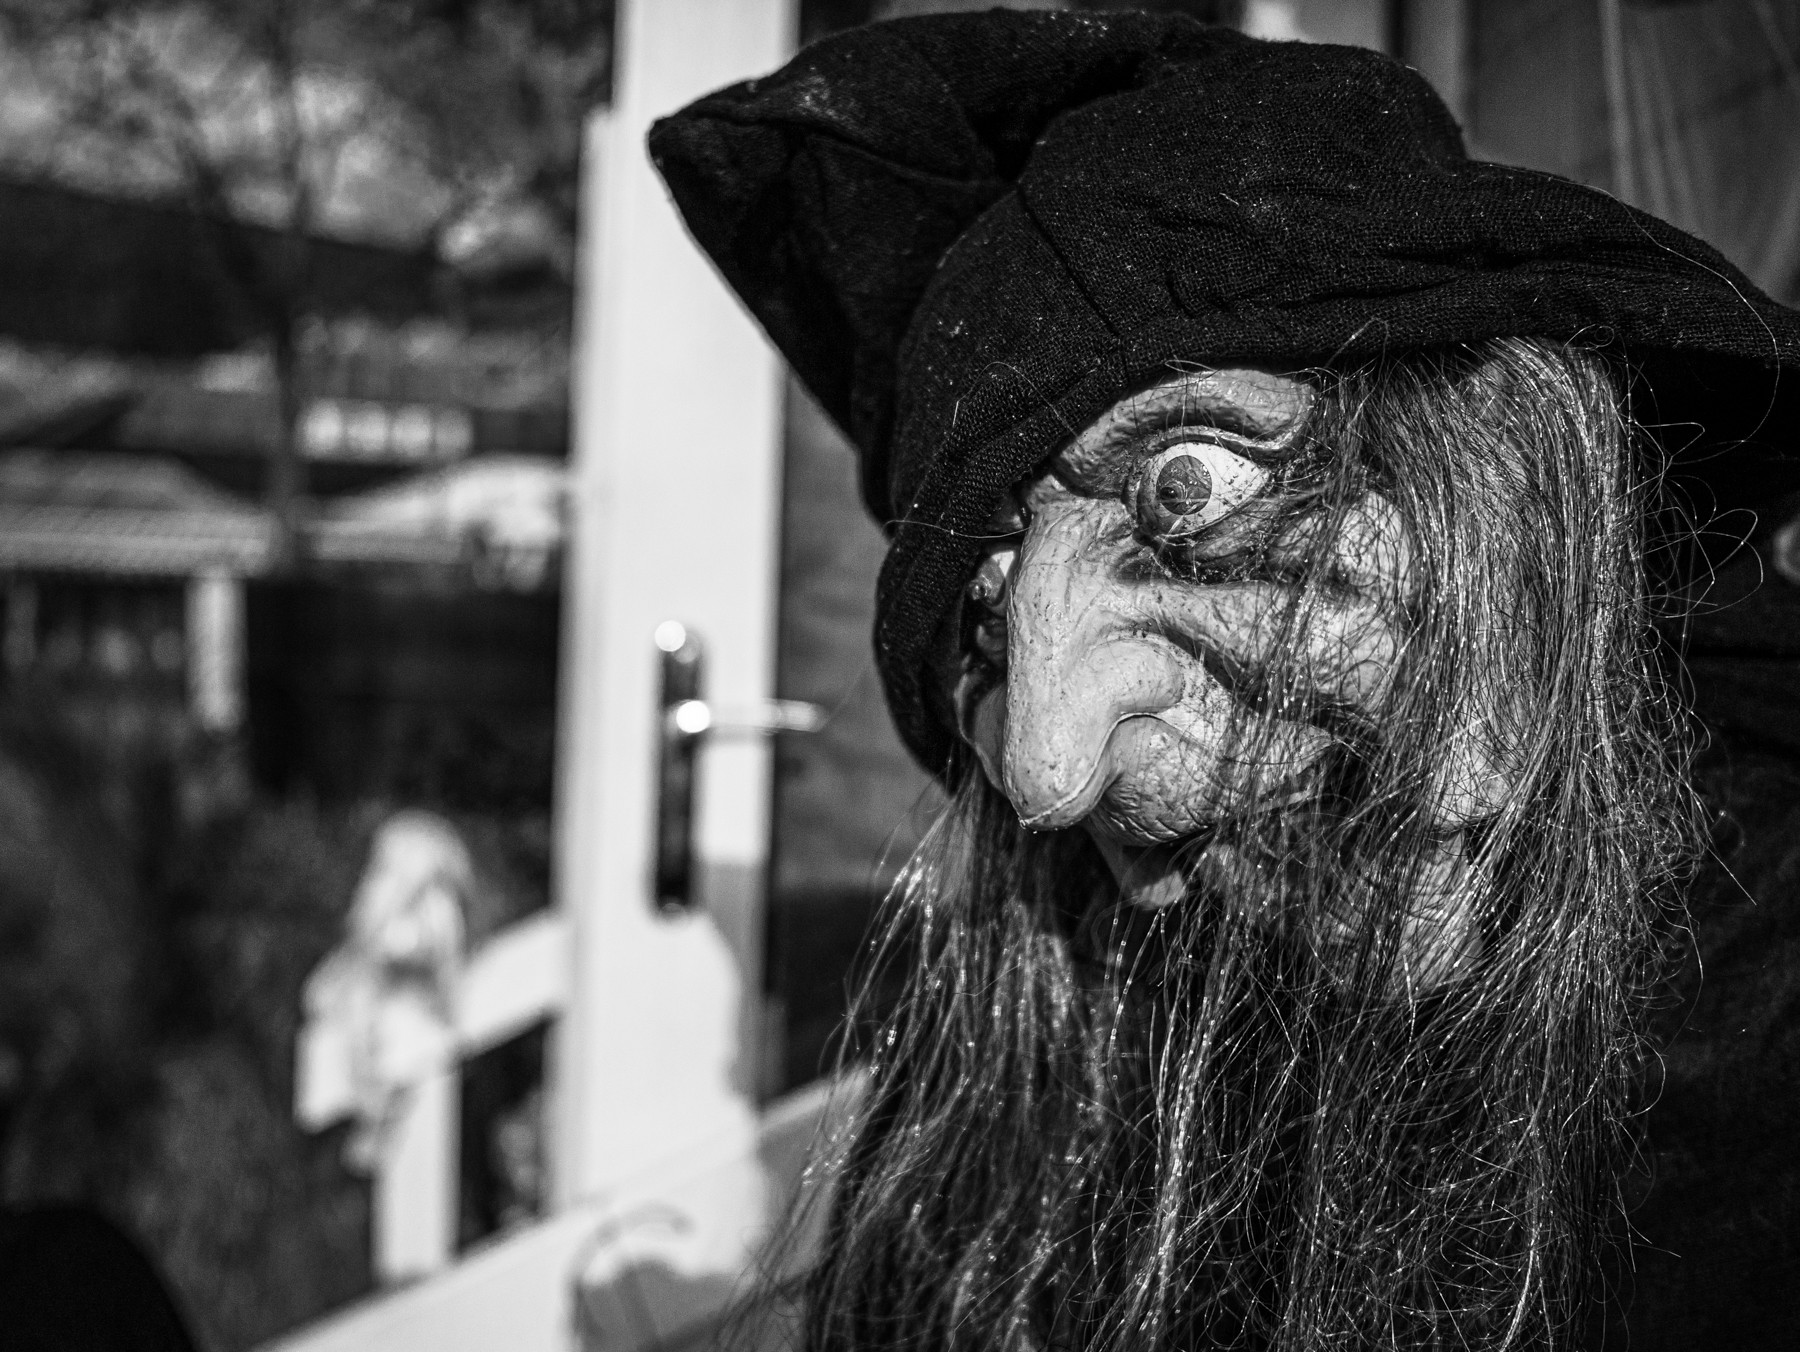 En gammel heks i Tivoli, Halloween